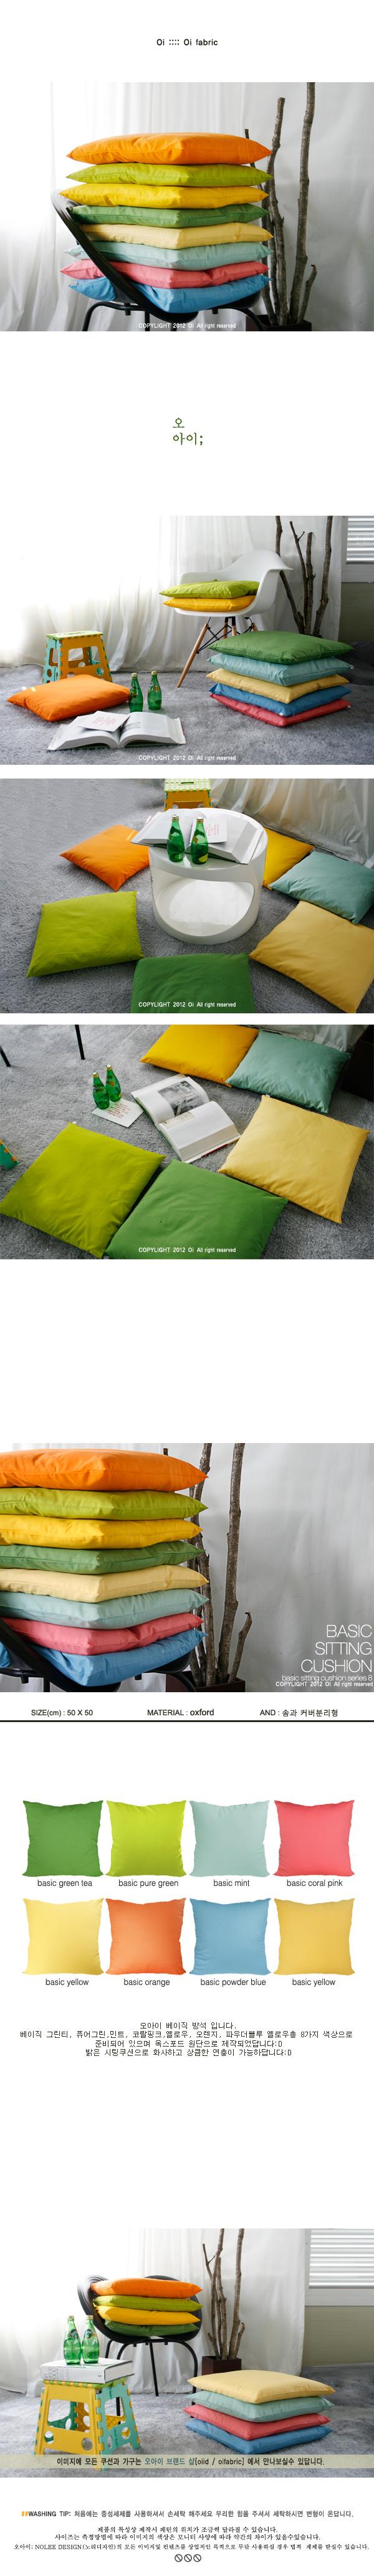 basic sitting cushion2(방석솜포함) - 오아이, 16,500원, 방석, 무지/솔리드